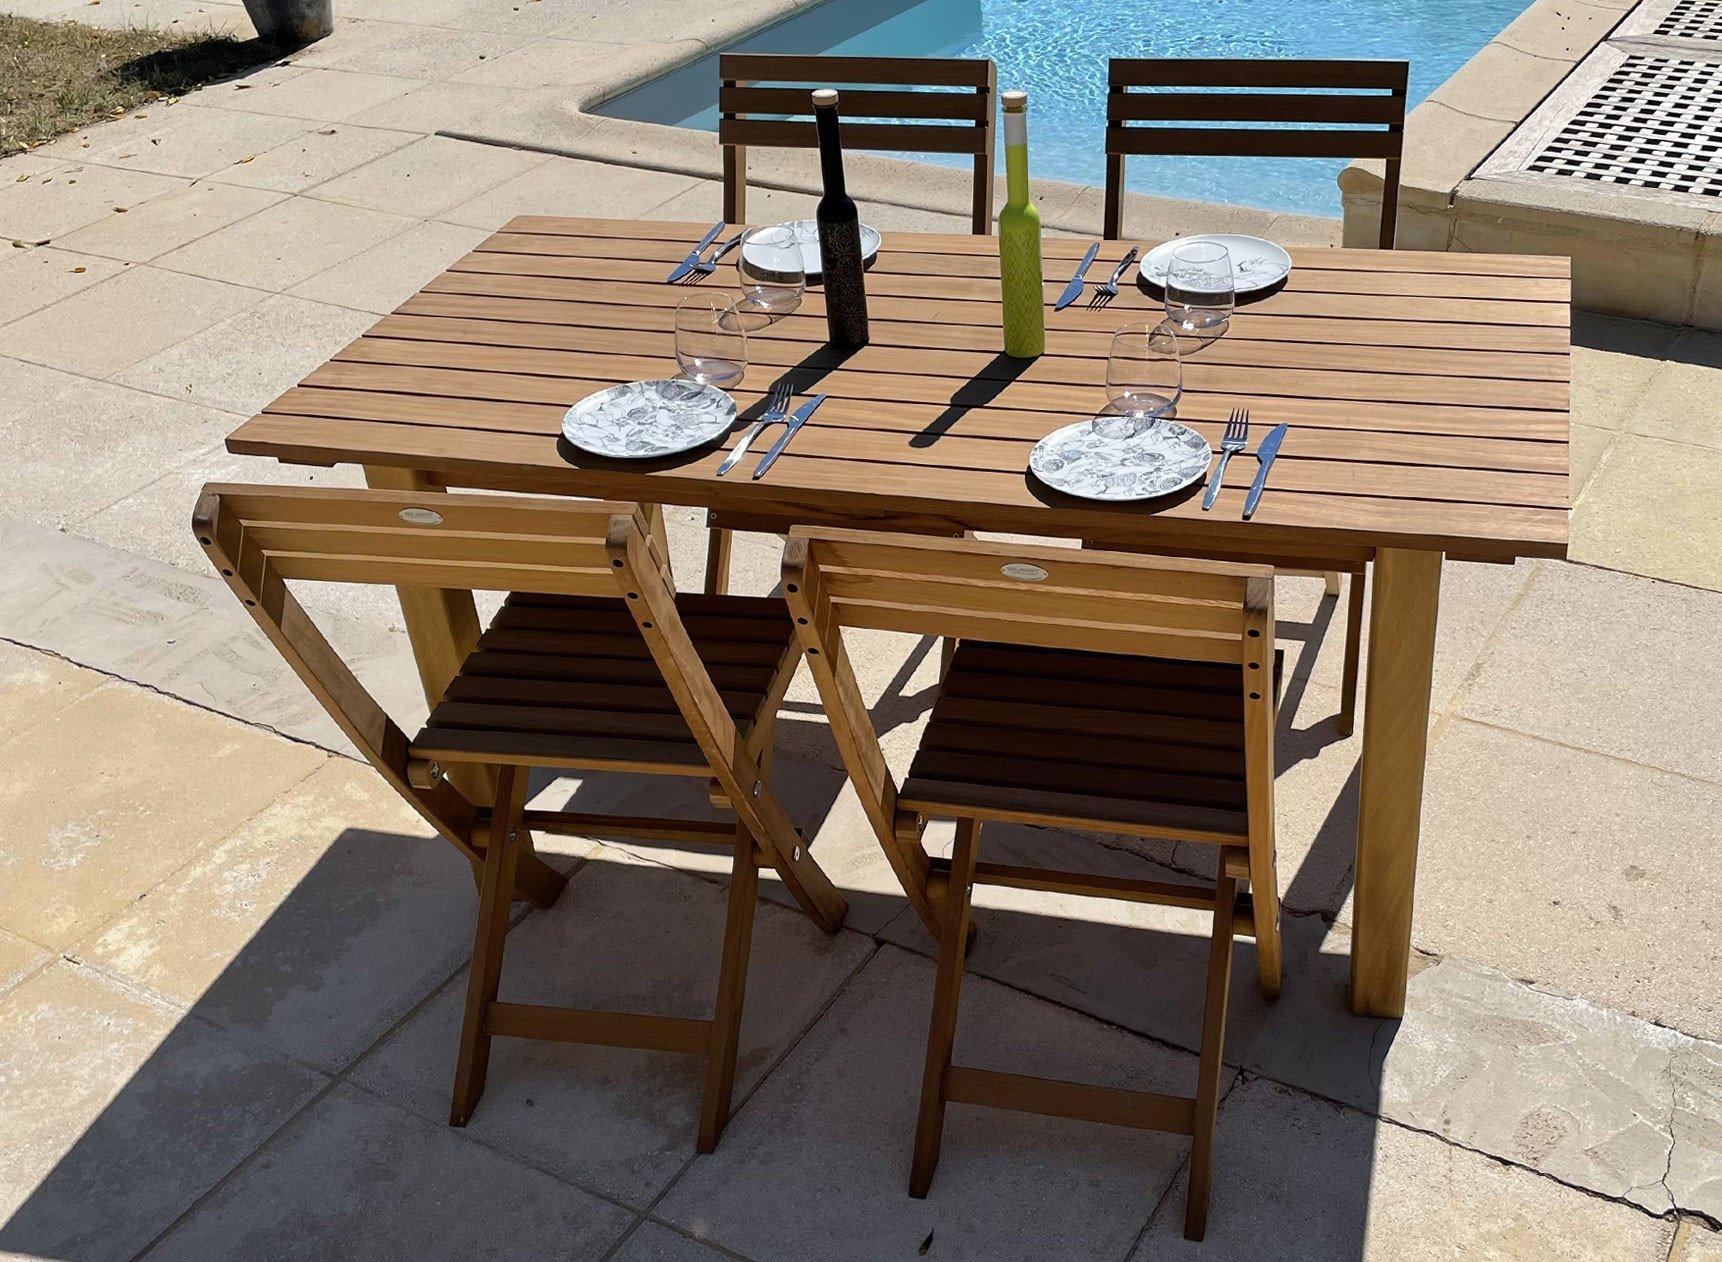 Table de jardin en bois massif MOOREA Nateo Concept - 1